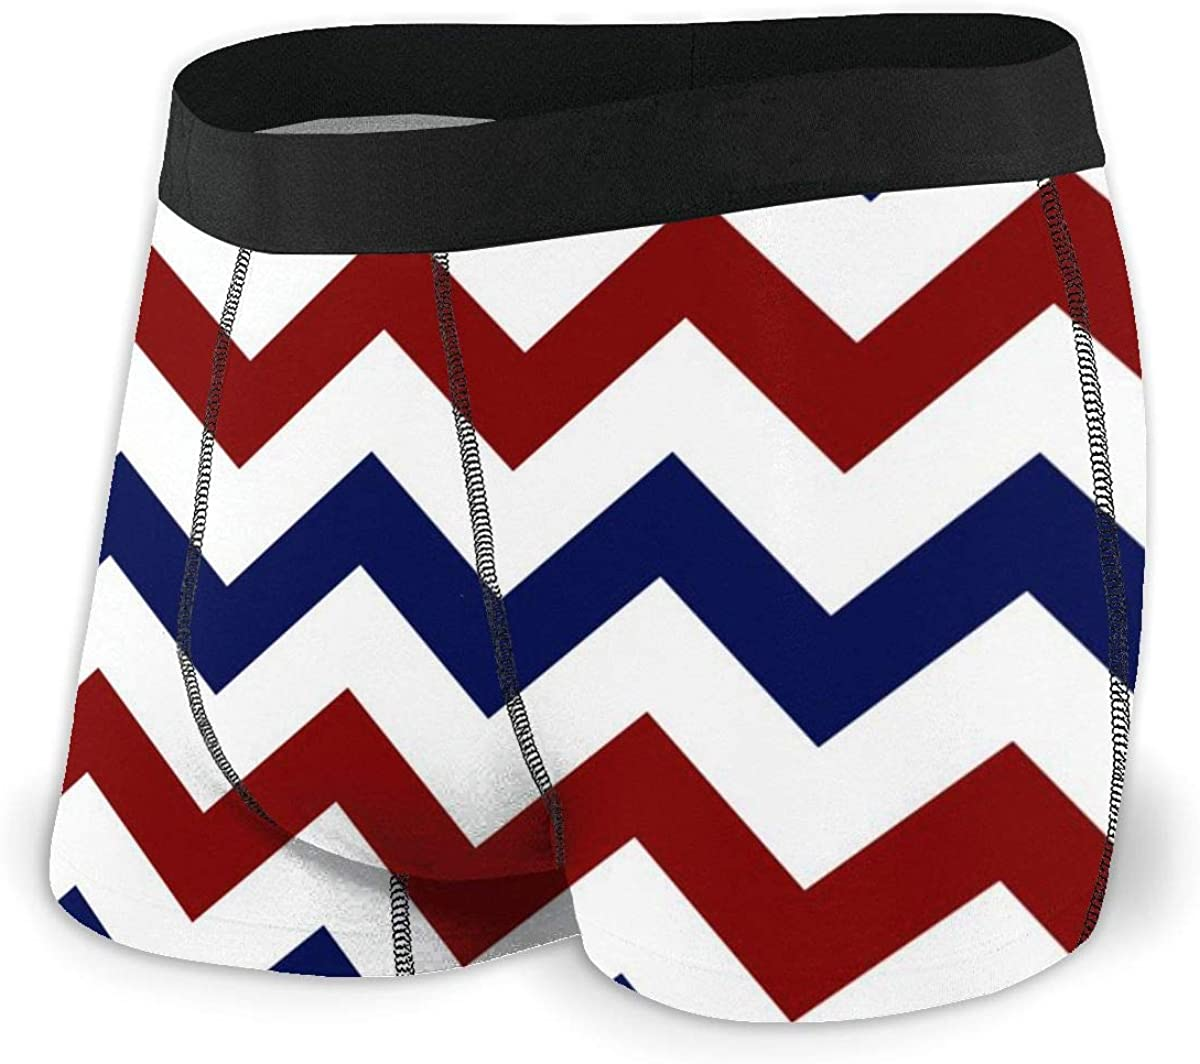 Mens Boxer Briefs Red, White, and Blue Chevron Stripe Breathable Underwear